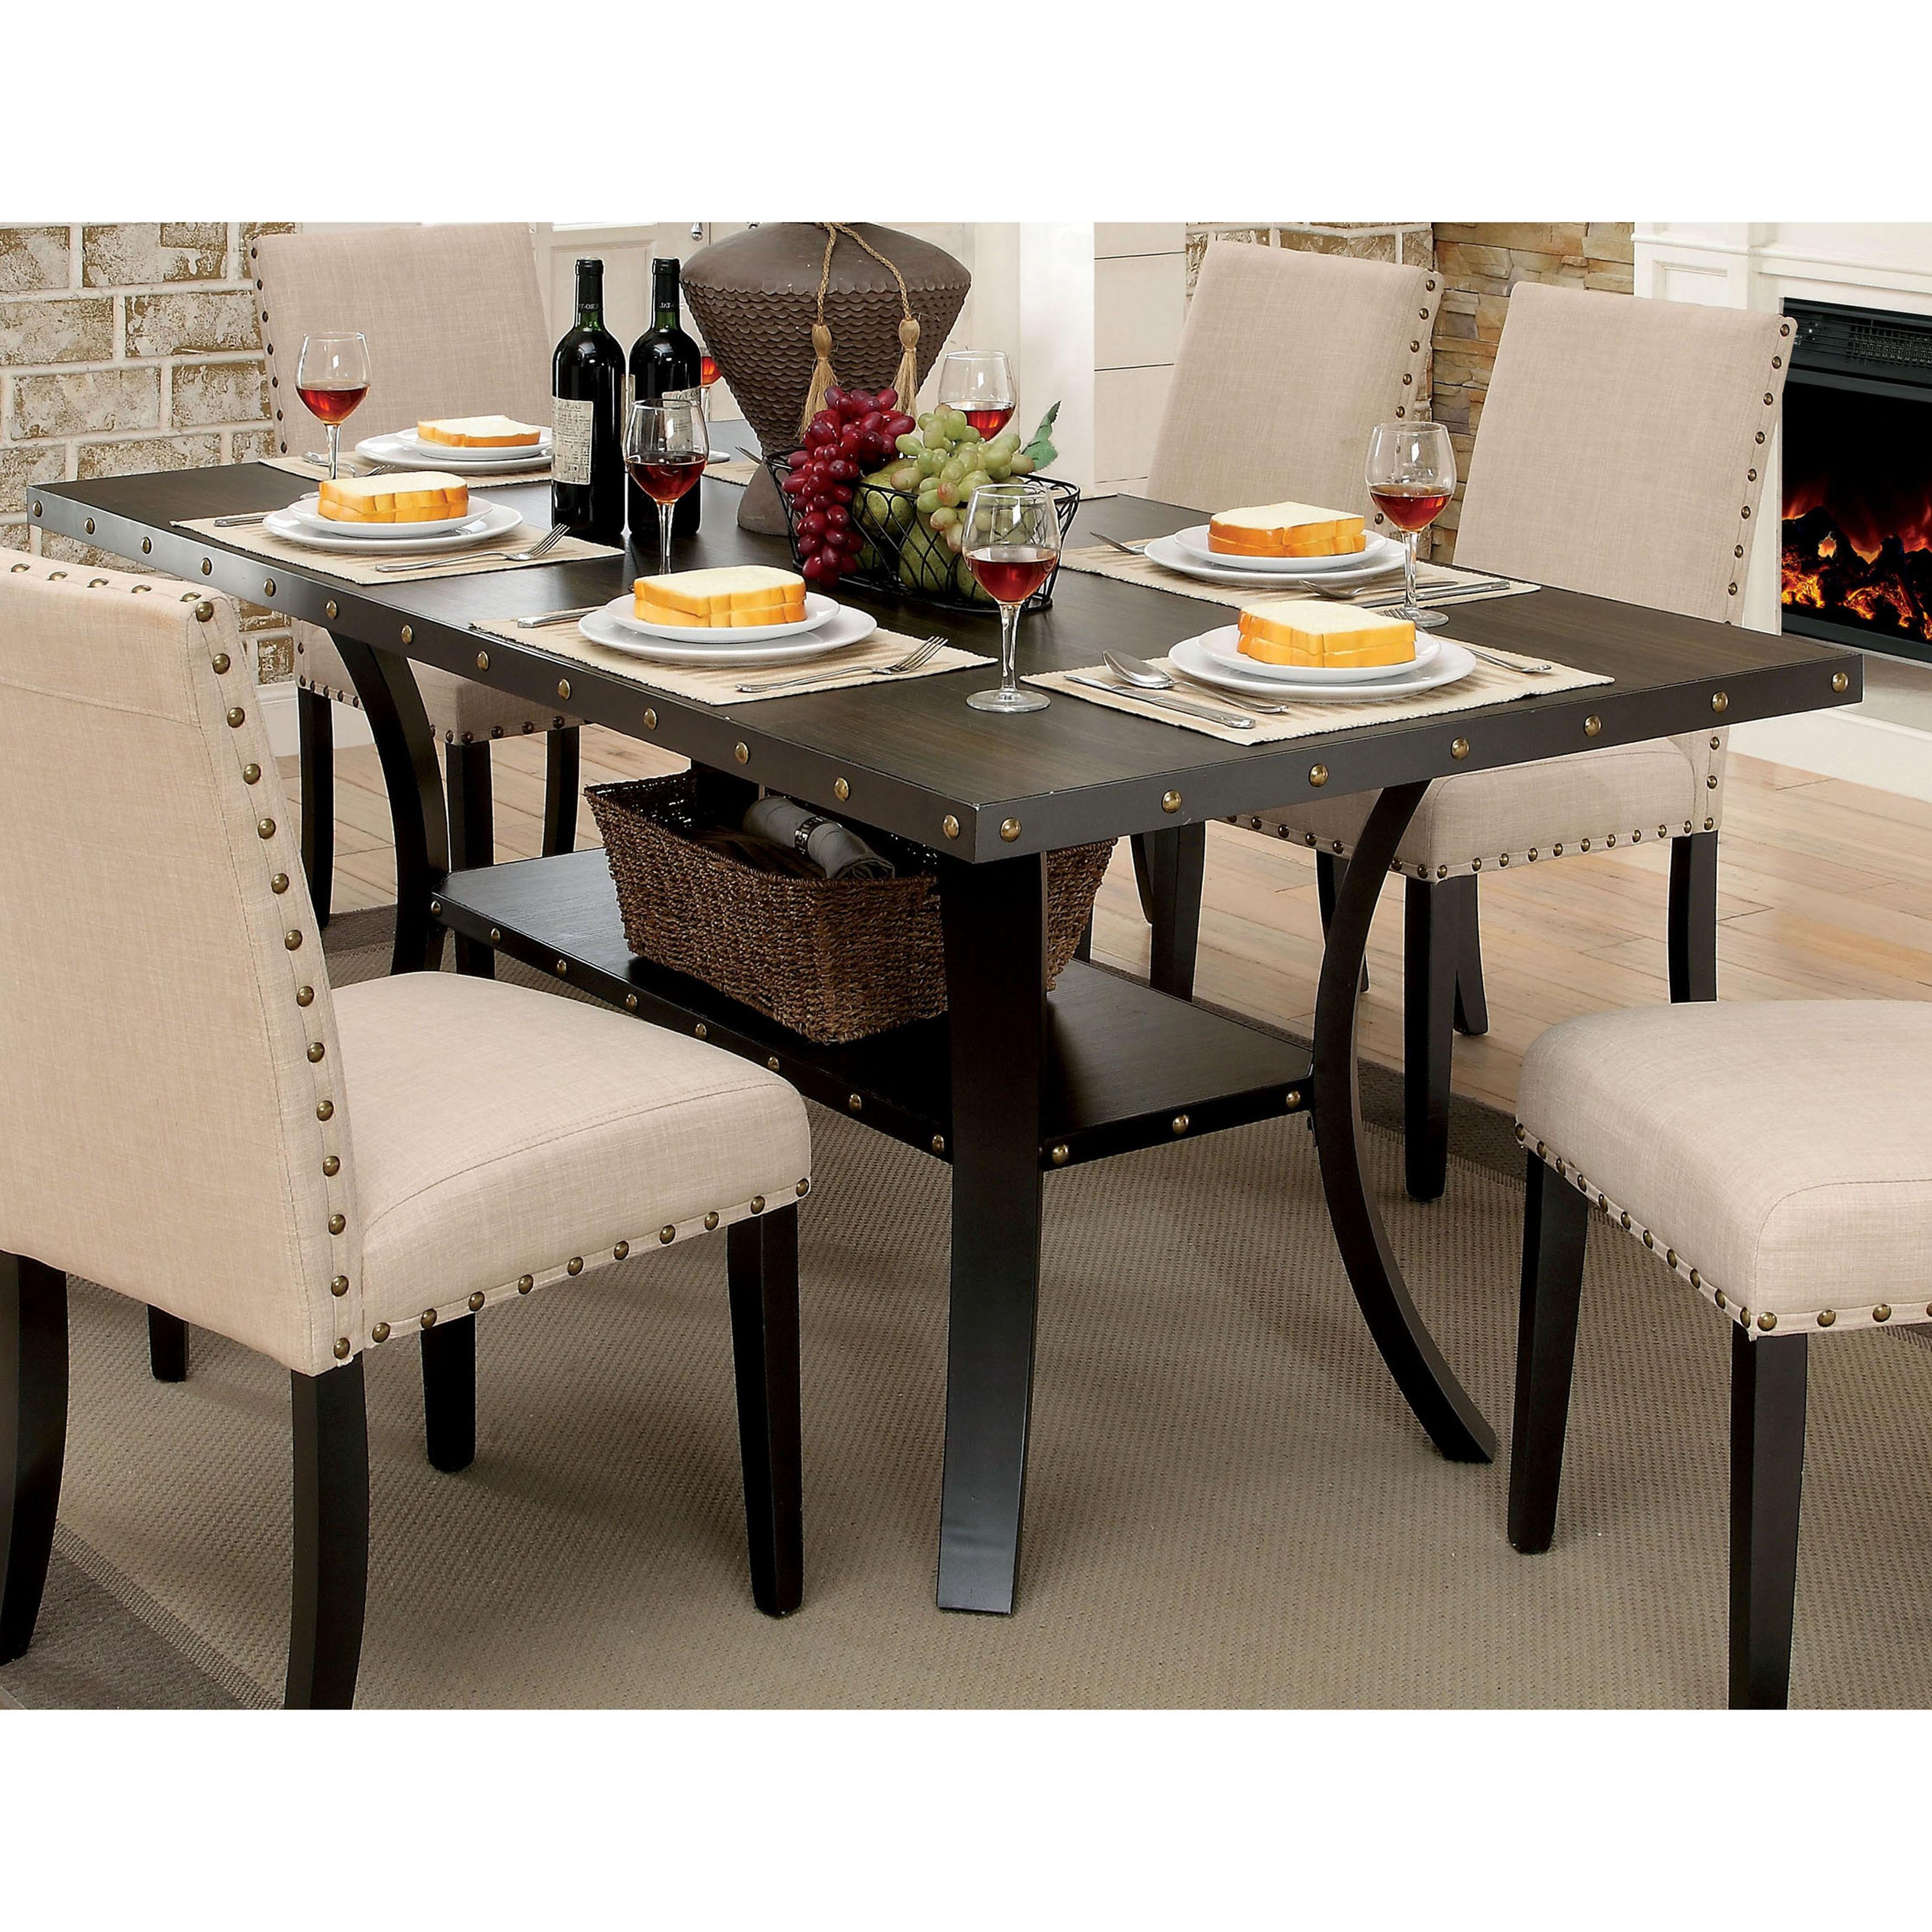 Furniture of America Simmerton Walnut-finish Wood 70-inch Industrial Dining  Table - Walnut